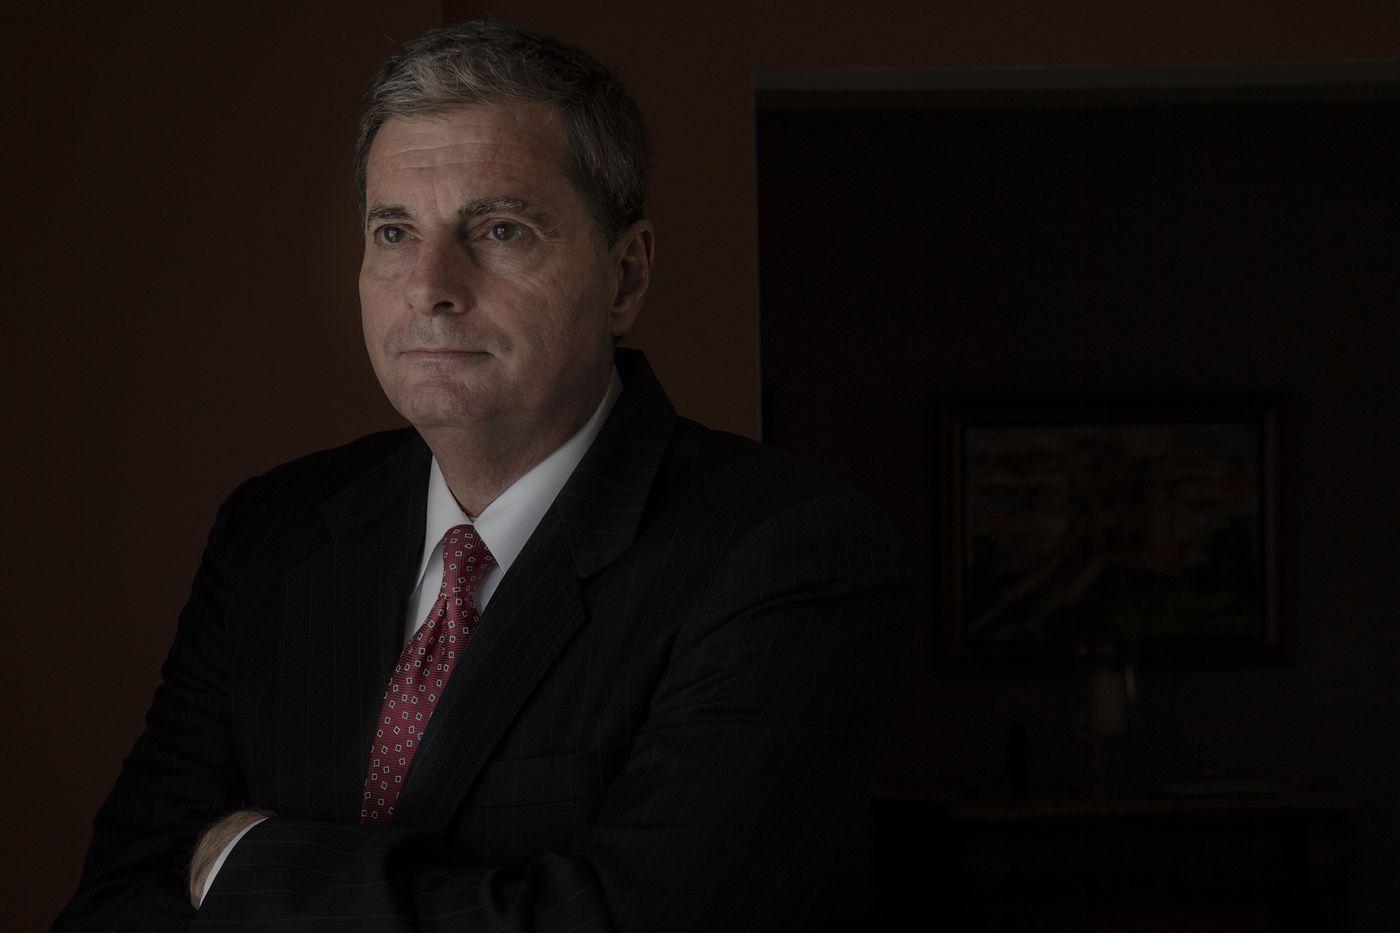 Bloomsburg University president, accused of sexual